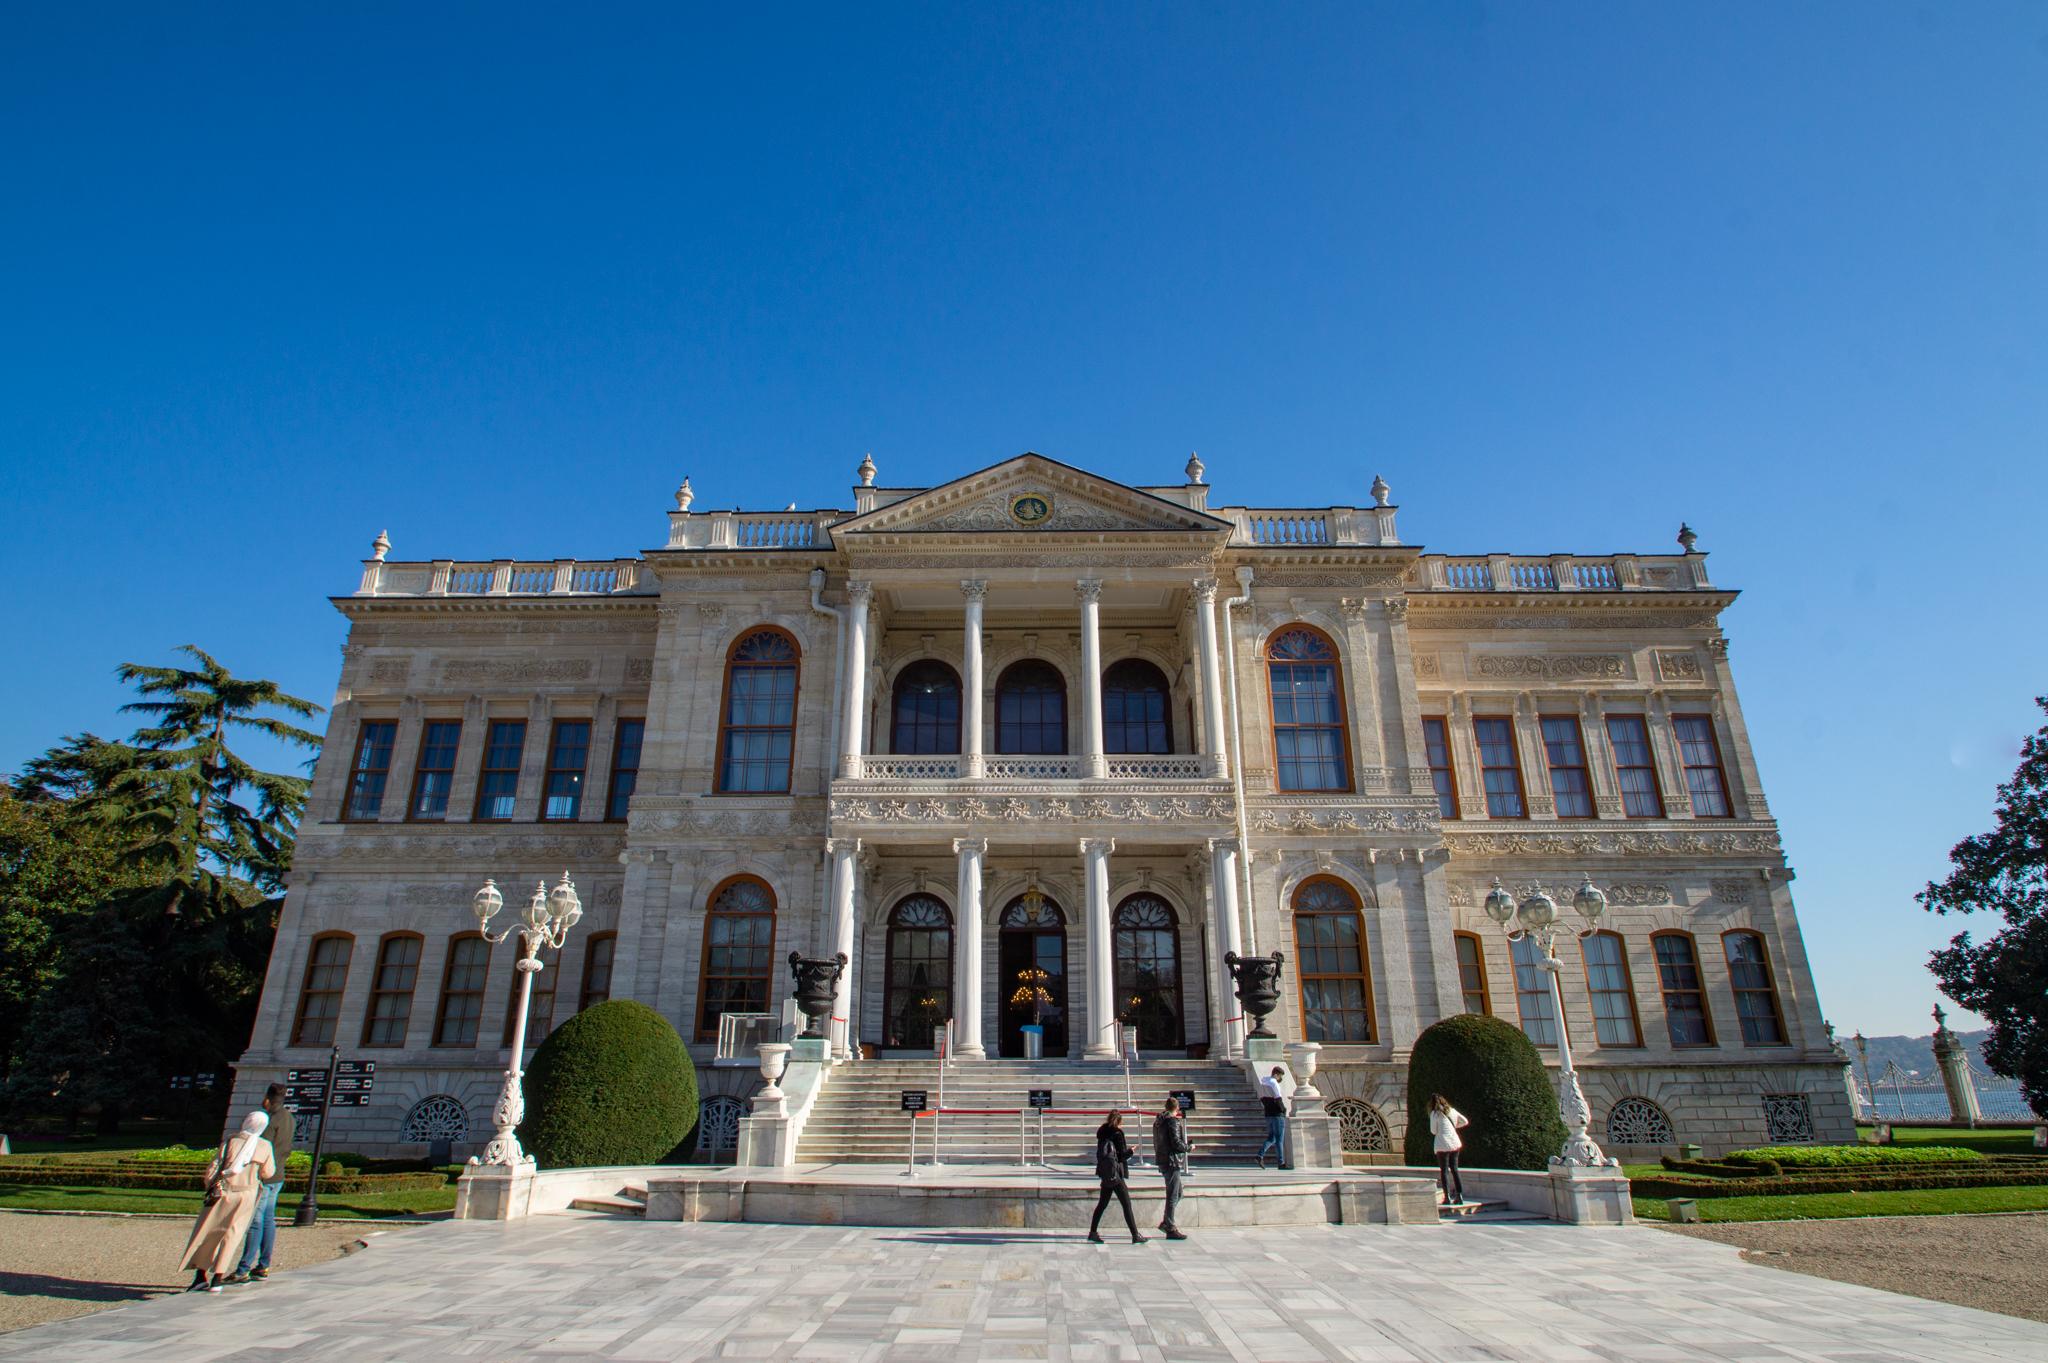 Istanbul Sehenswürdigkeiten: Dolmabahce Palast